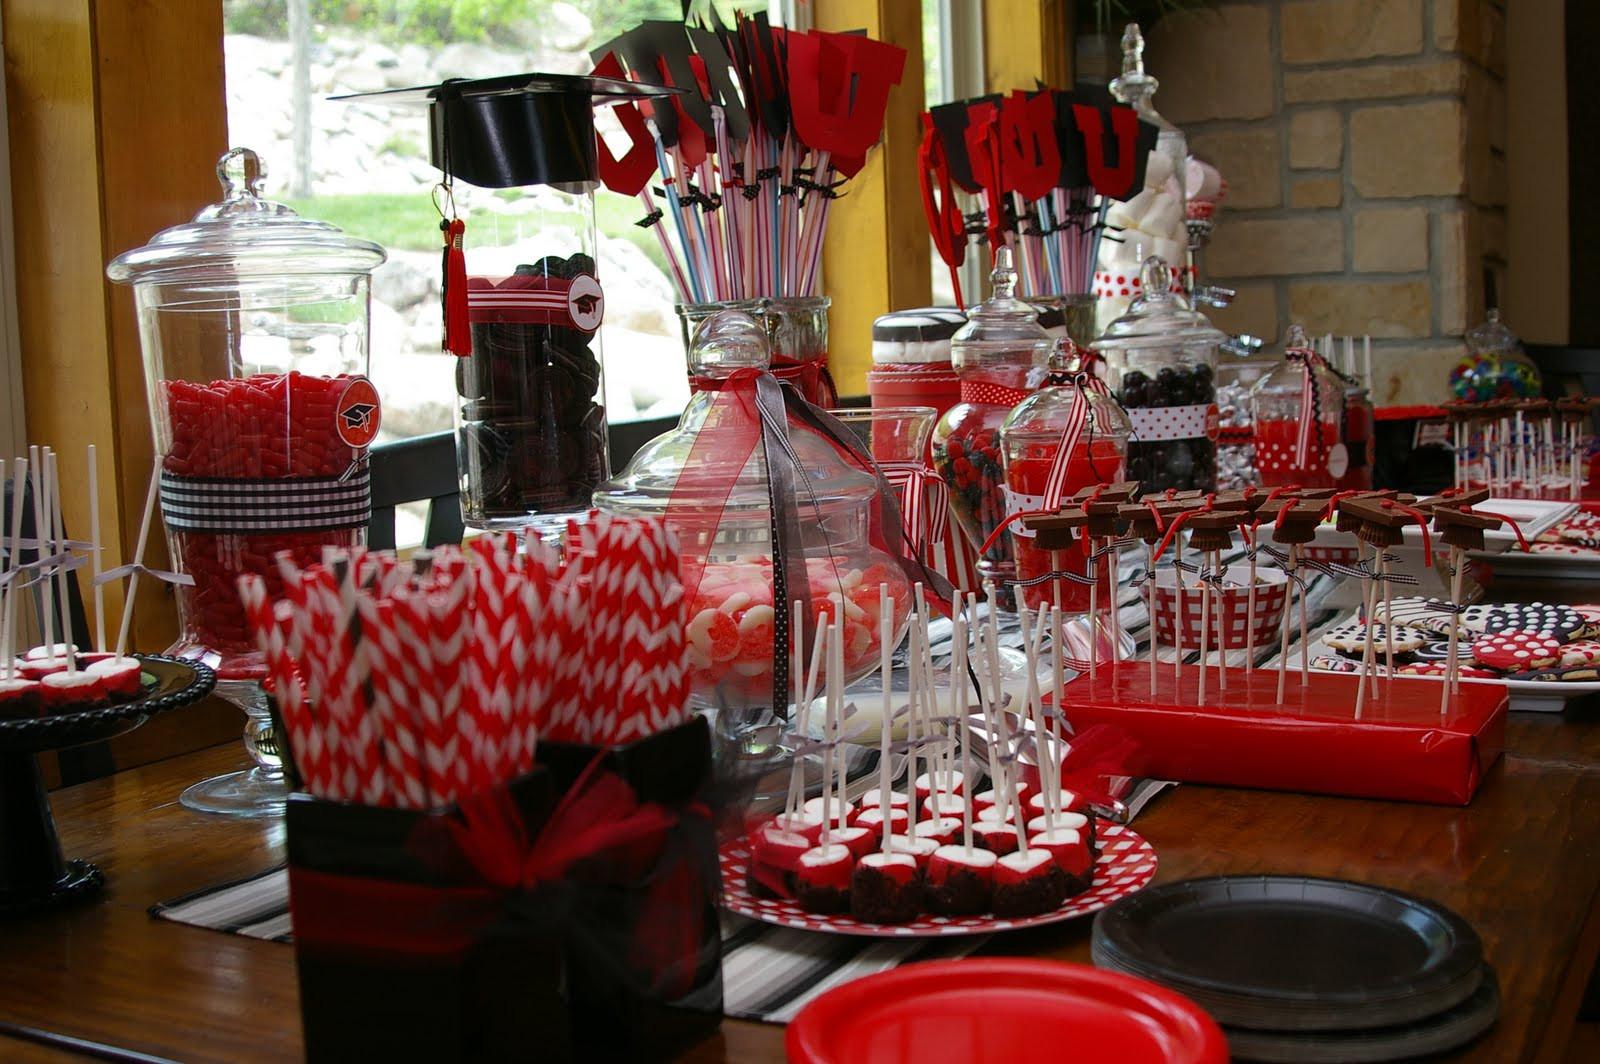 High School Graduation Party Ideas  Bridgey Widgey Graduation